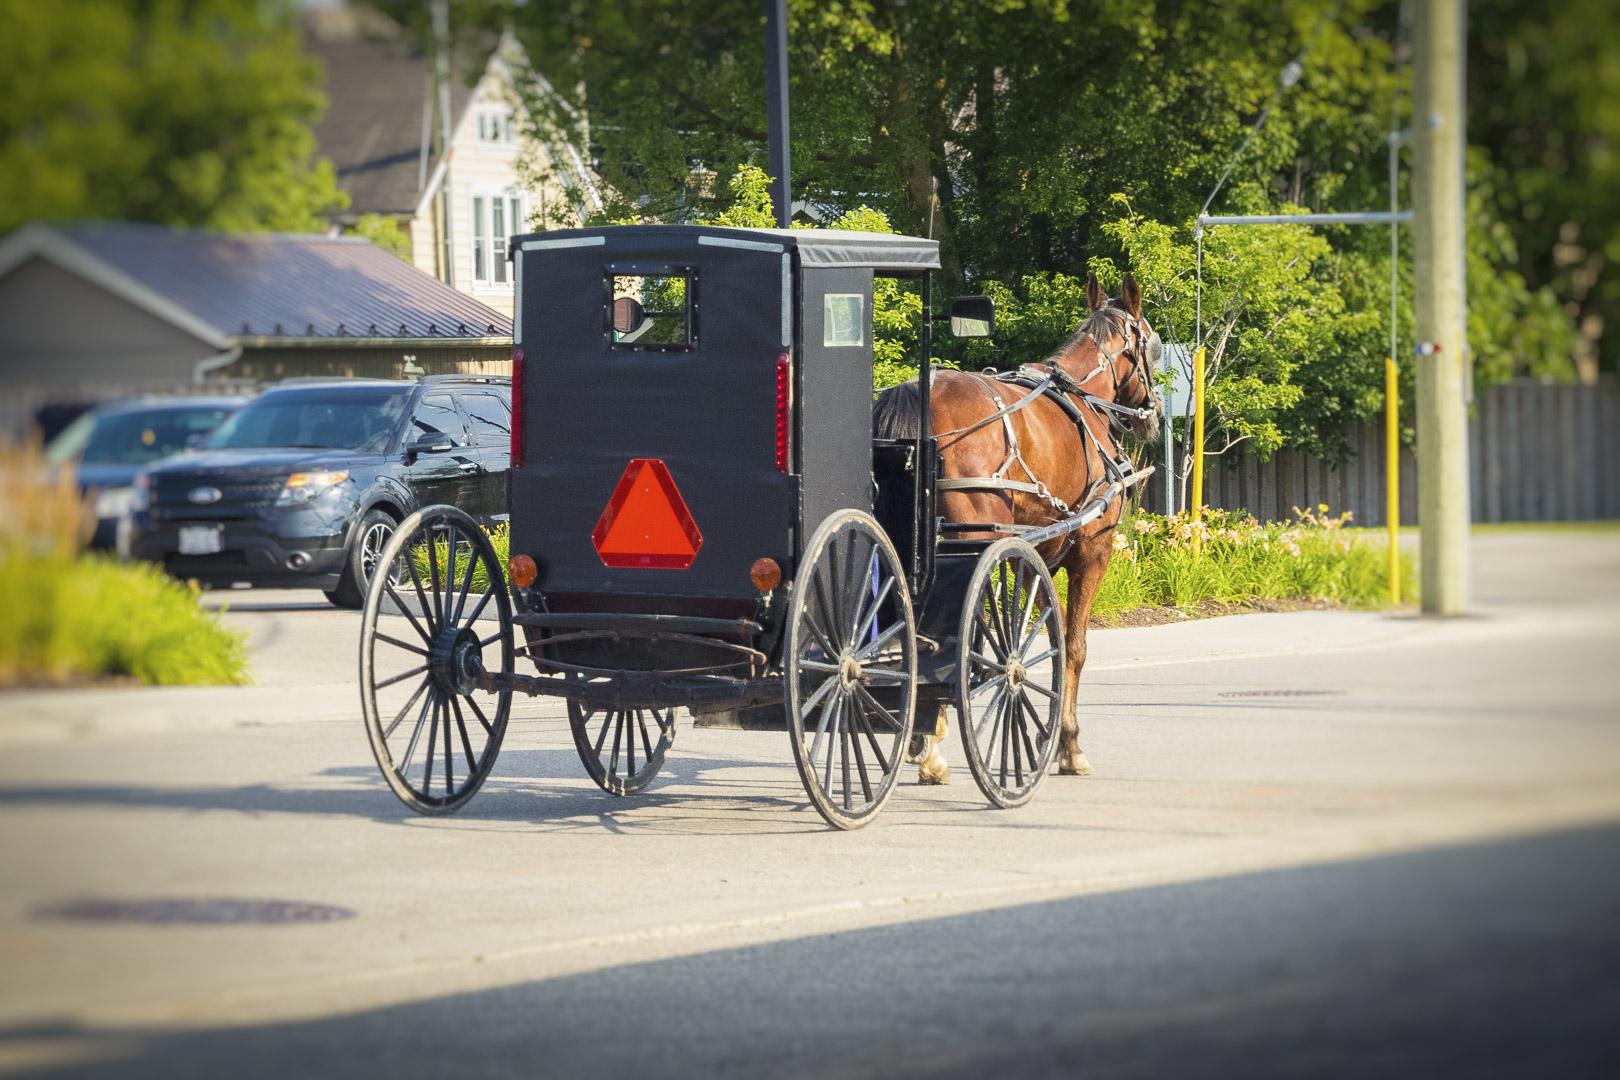 Mennonite Horse & Buggy